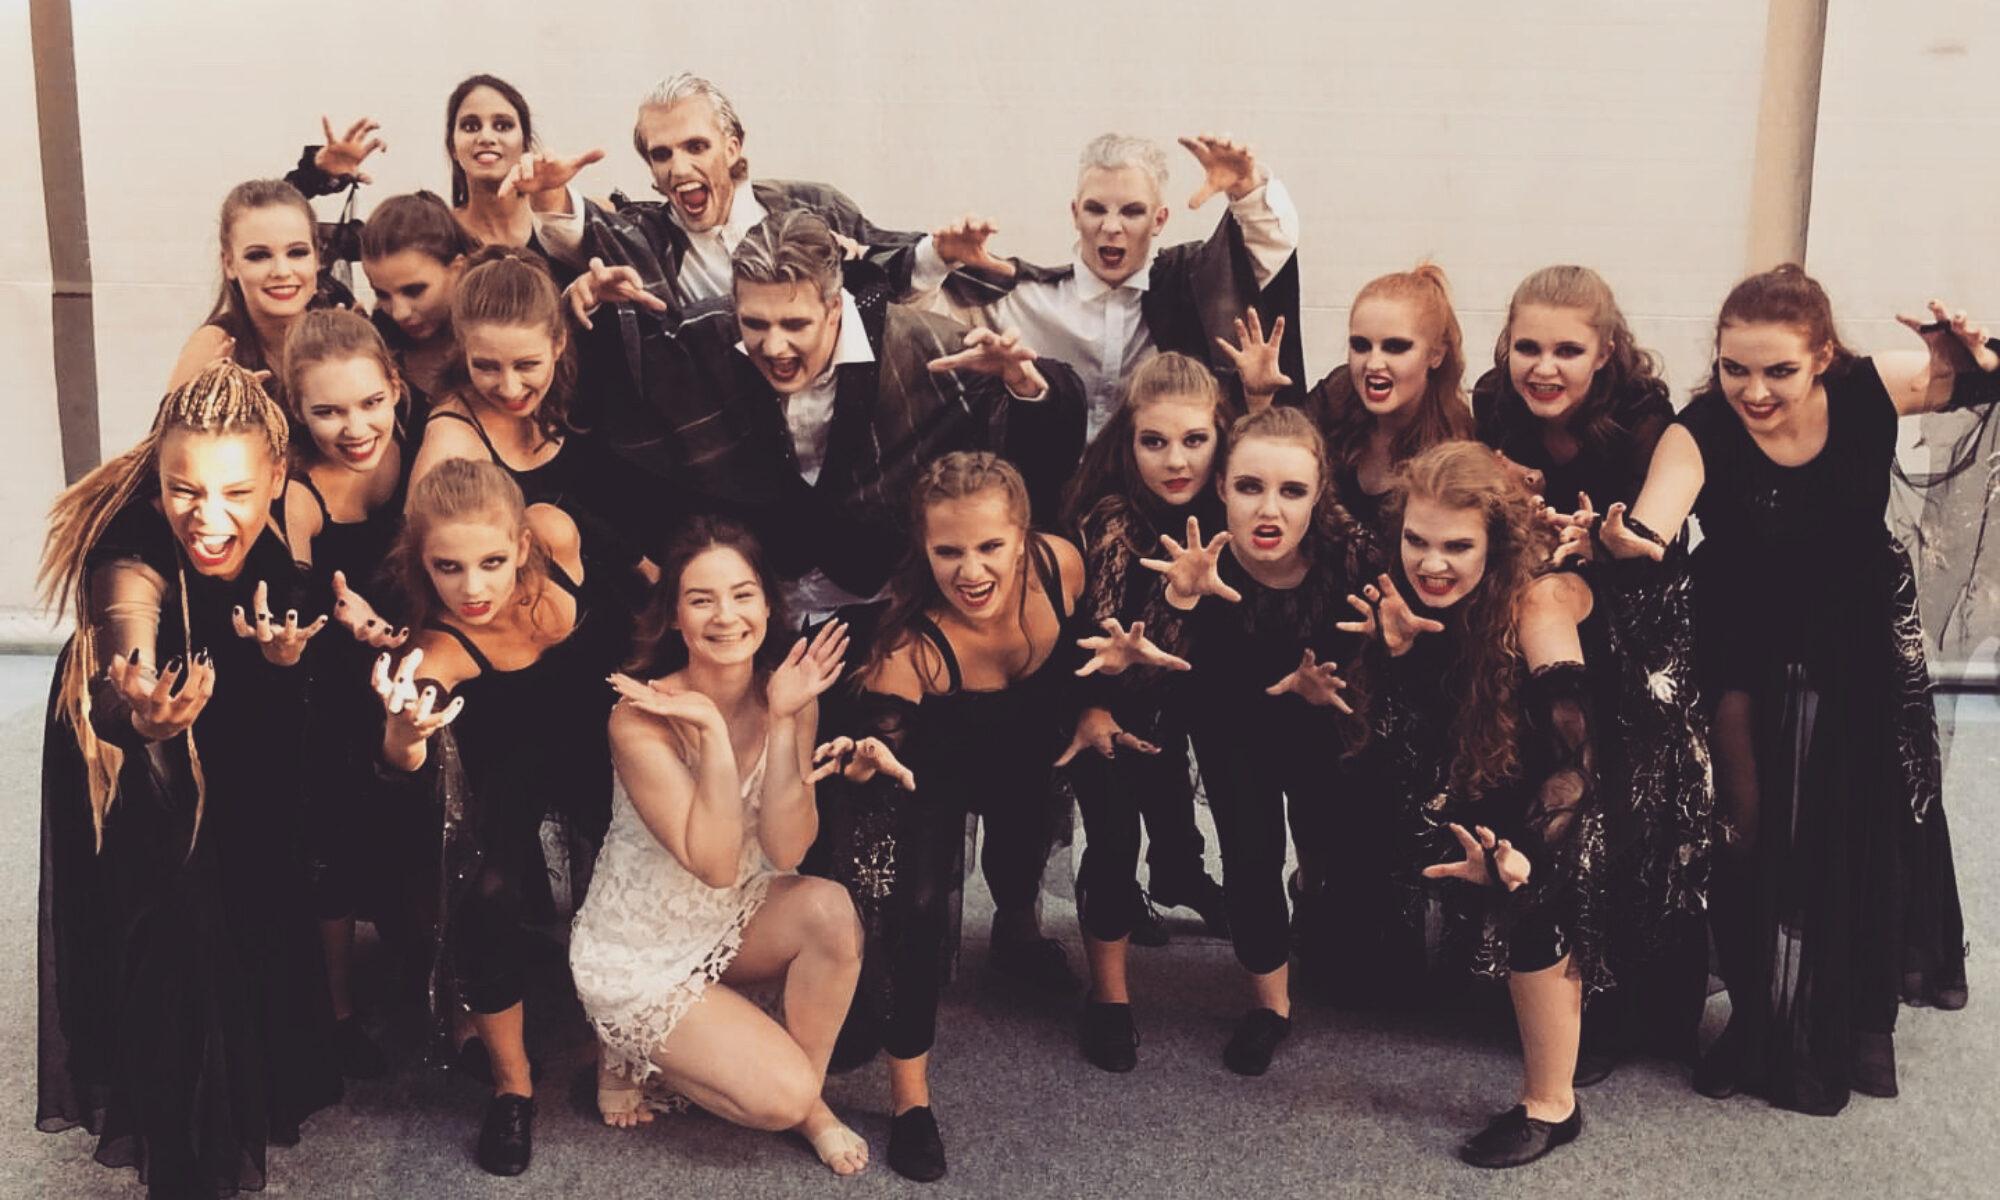 1. Tanzstudio Plauen 1967 e.V.